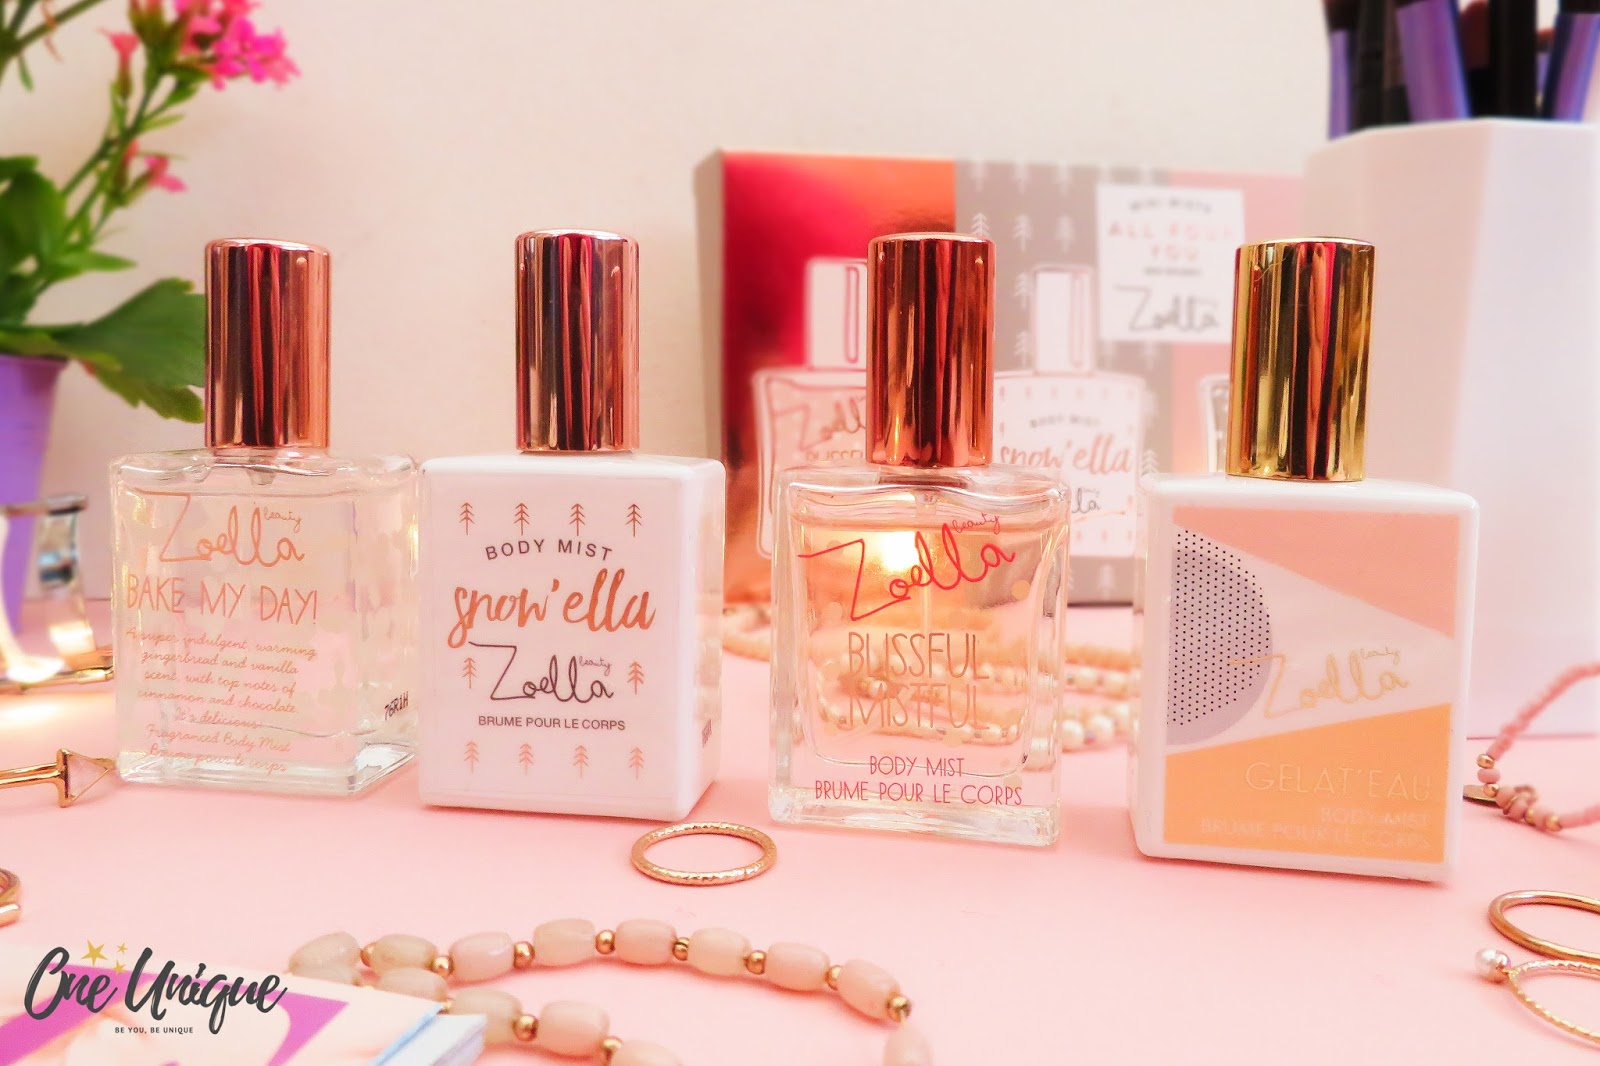 ZOELLA GINGERBREAD Body Mist Perfume